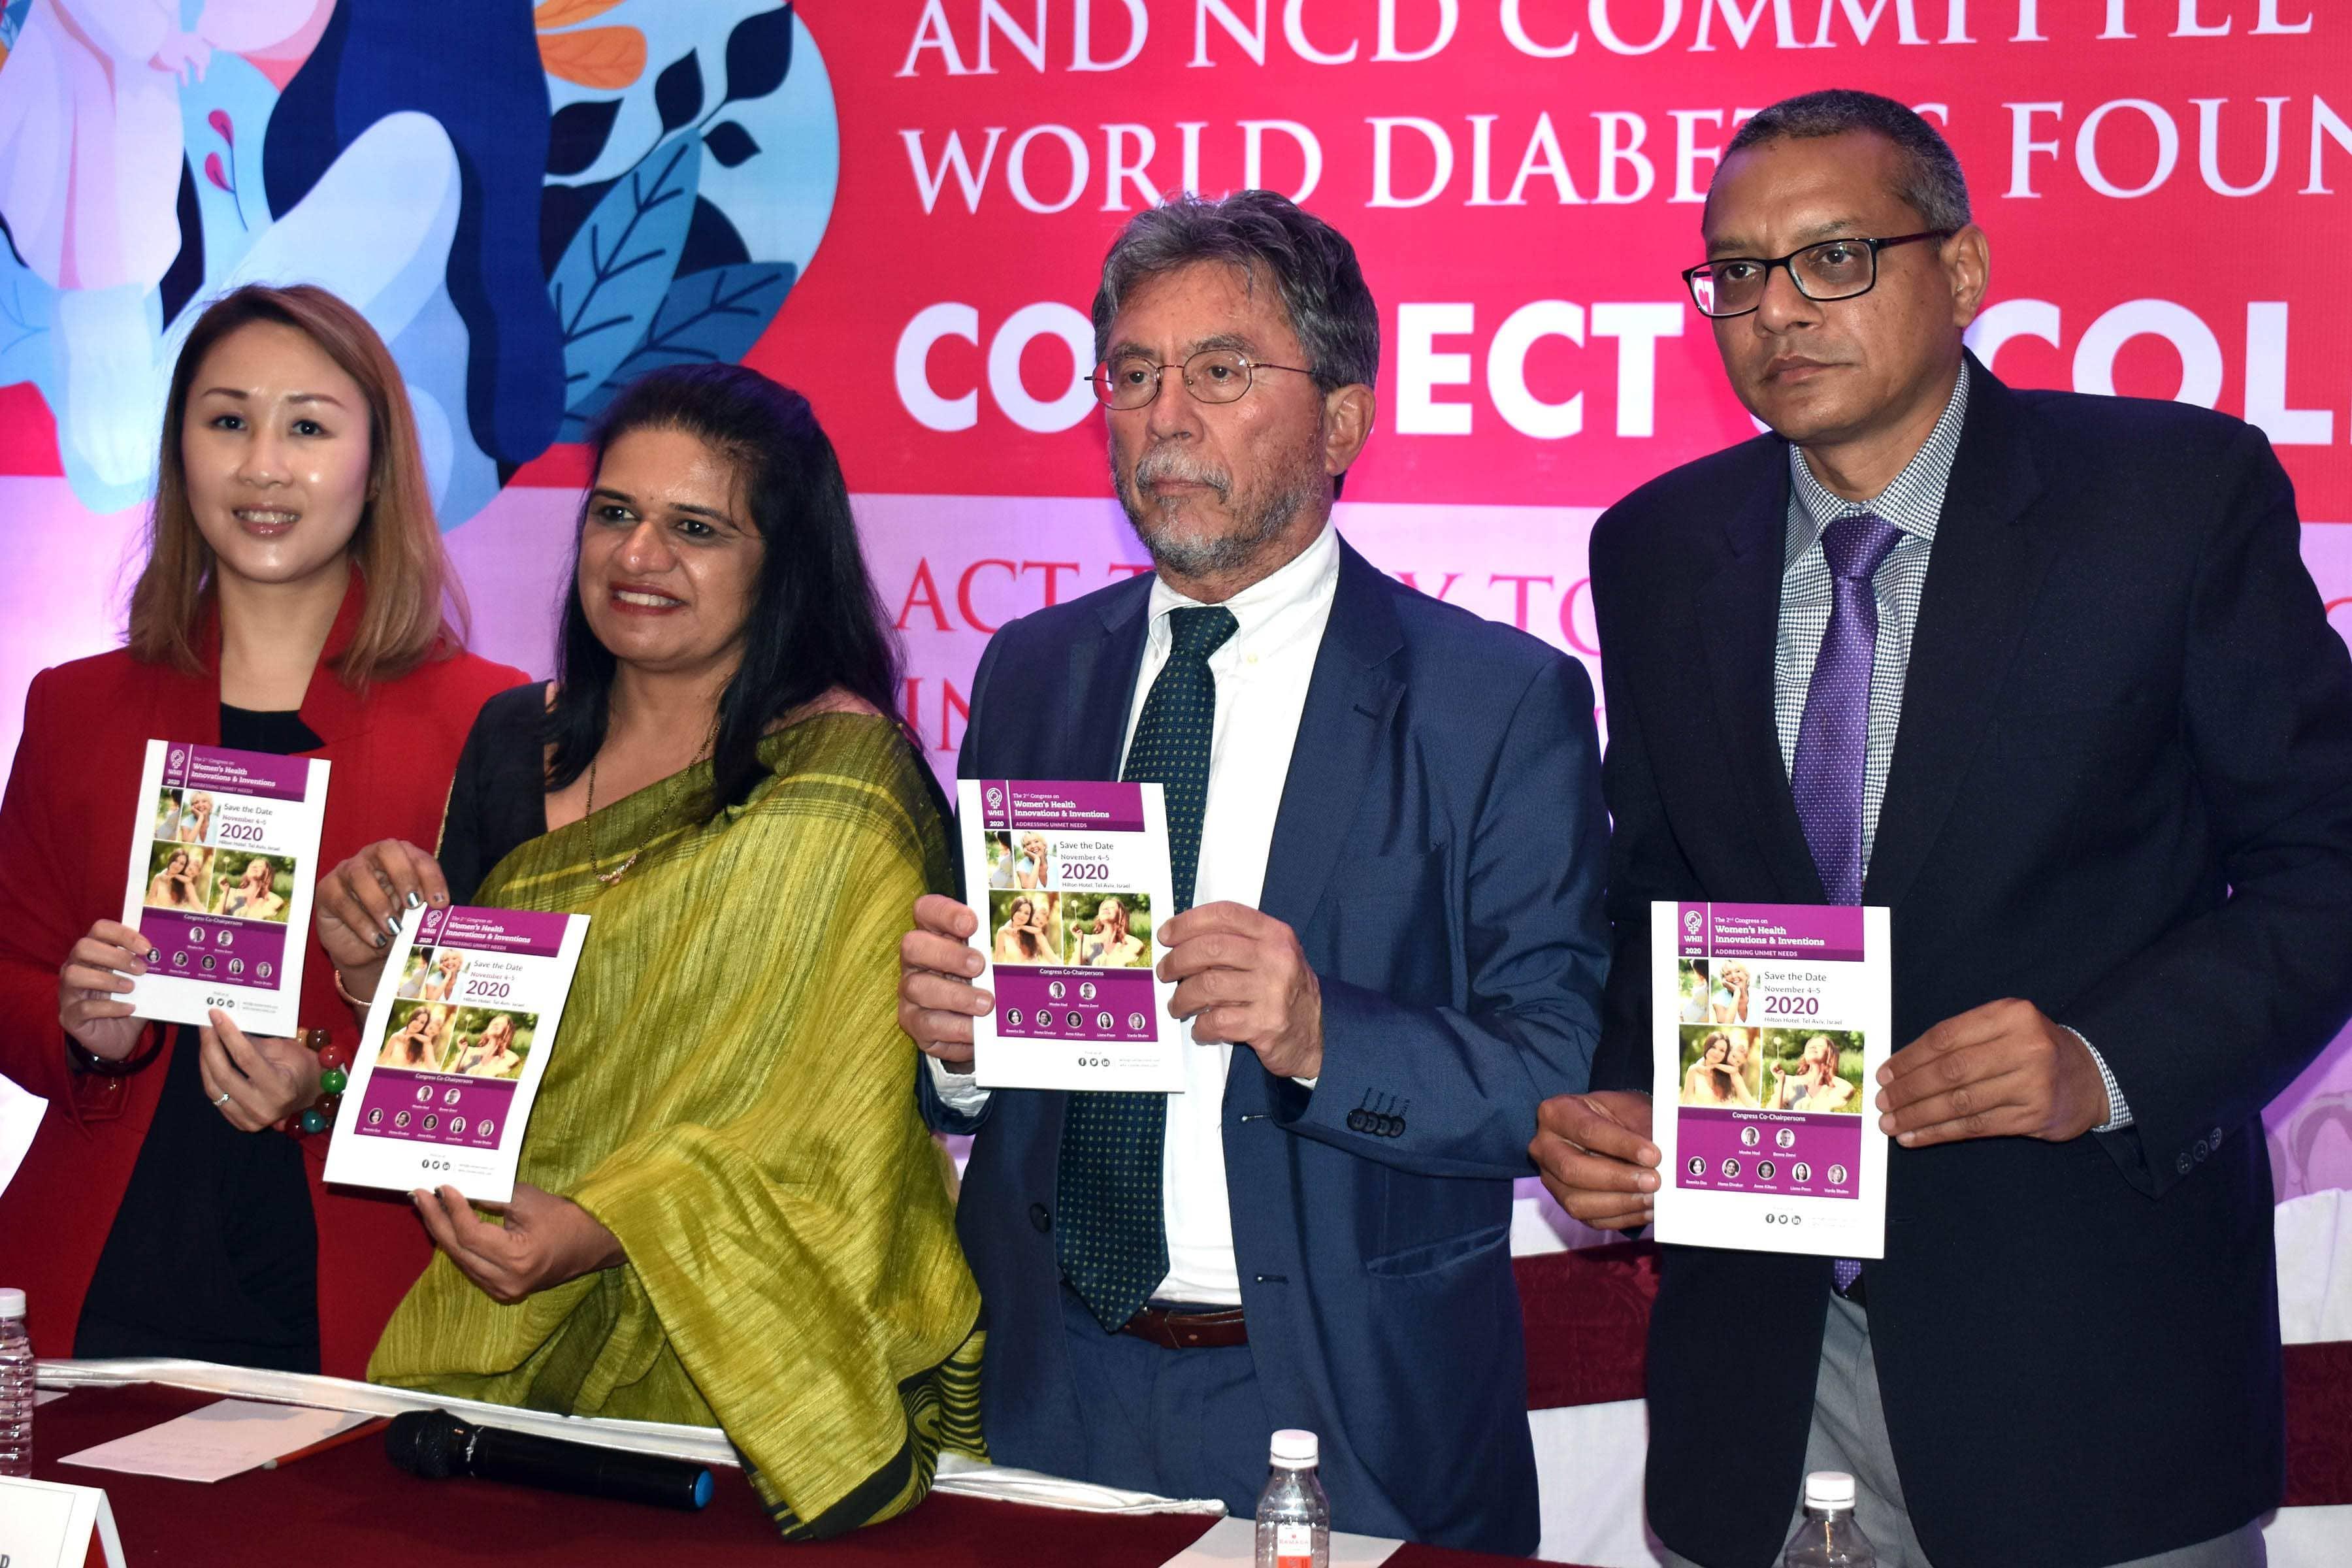 Pregnancy & Non-Communicable Diseases Committee (PNCDC) International Federation of Gynecology & Obstetrics (FIGO) @Ramada Plaza, Varanasi on 30th January 2020.